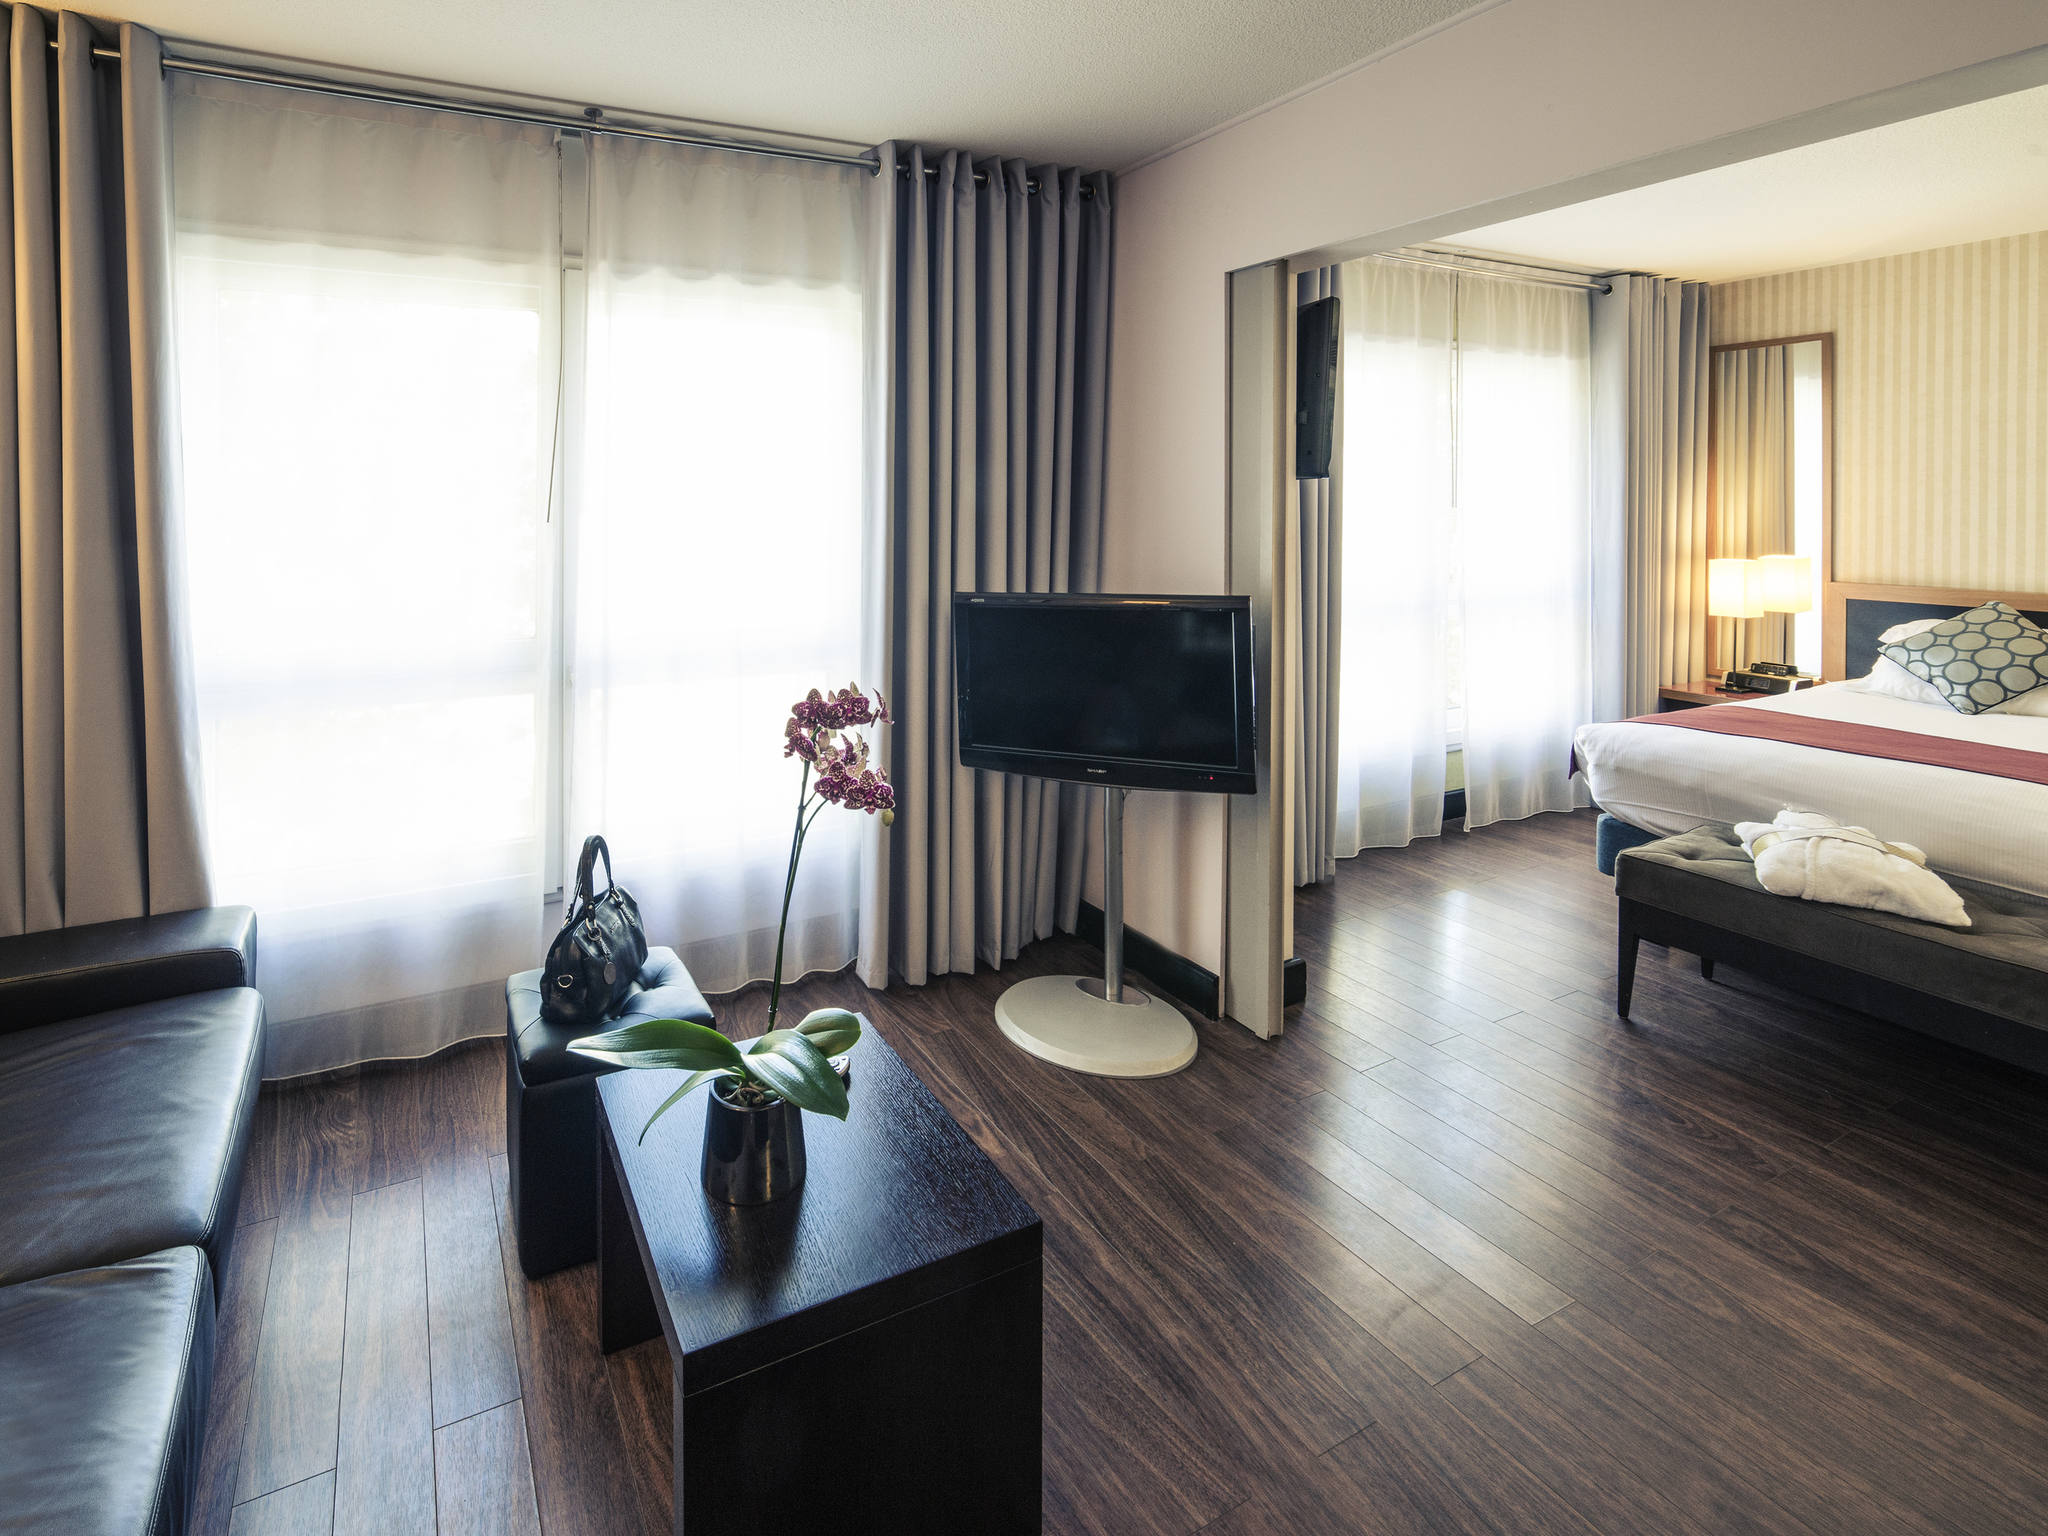 la suite perols rooms novotel suites montpellier eurotel la suite perols brit hotel. Black Bedroom Furniture Sets. Home Design Ideas